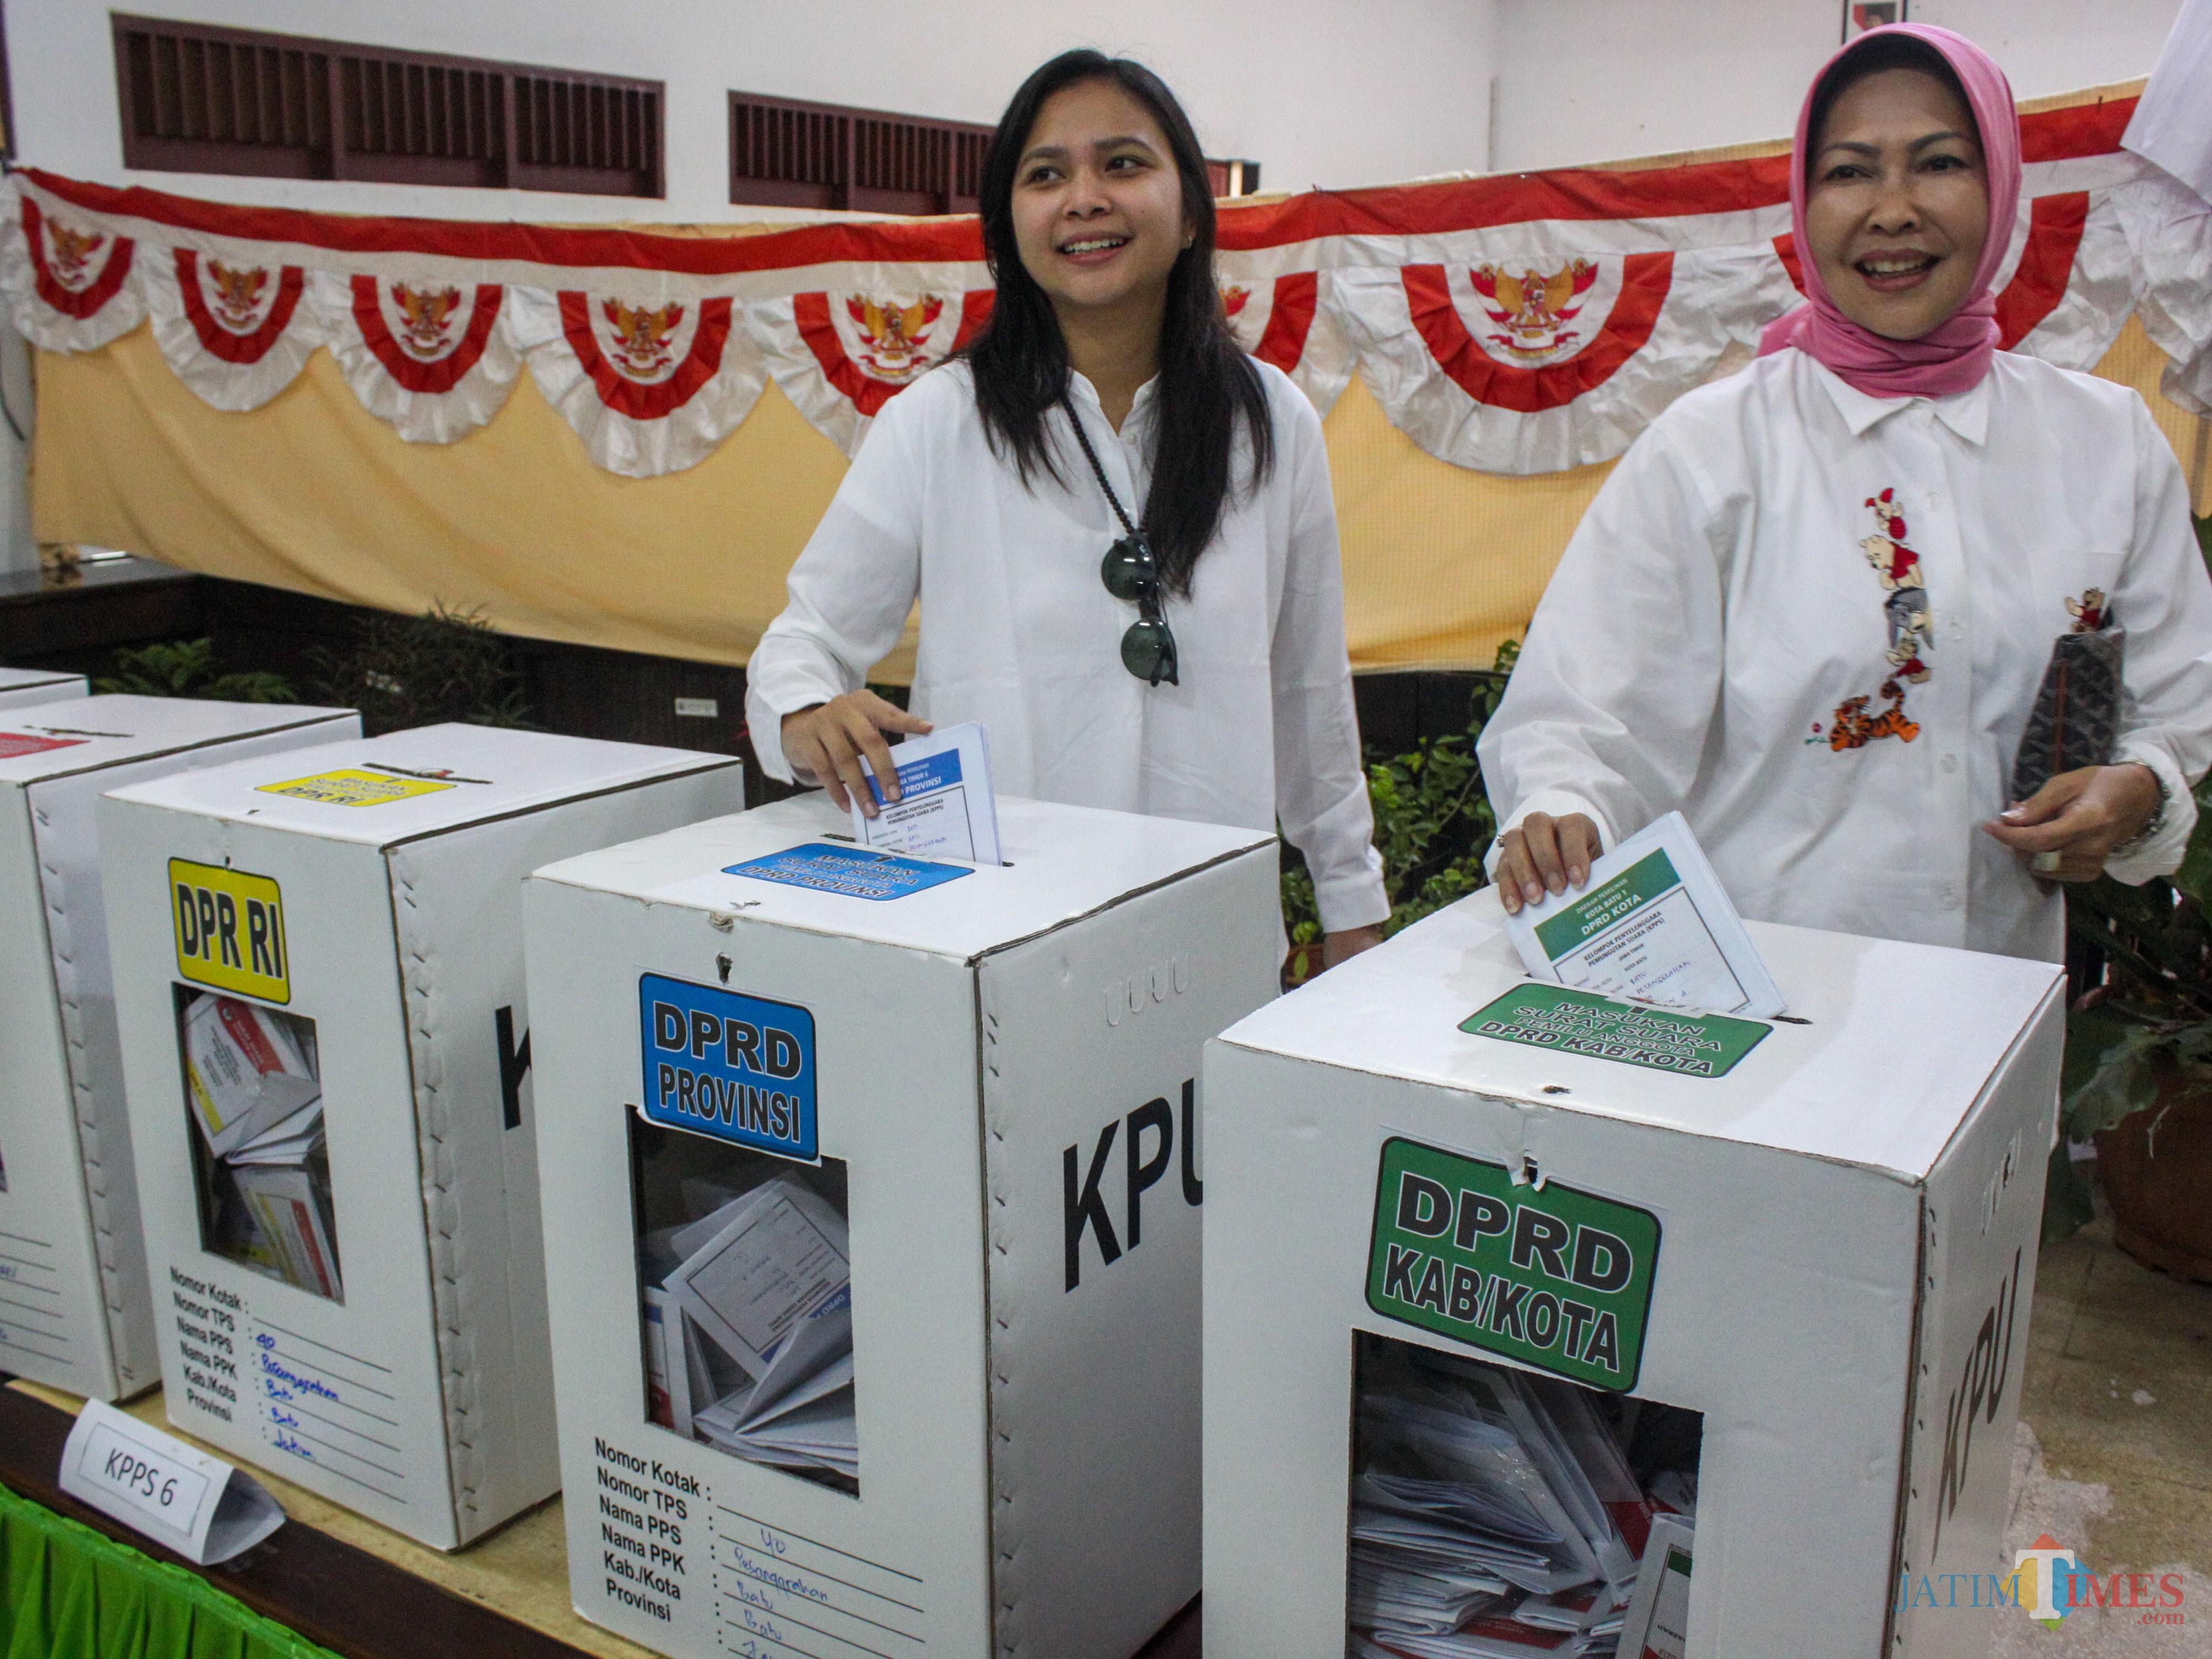 Ganis Rumpoko (kiri) dan Wali Kota Batu Dewanti Rumpoko (kanan) memasukkan surat suara di TPS di Kota Batu (Luqmanul Hakim/Malang Times)